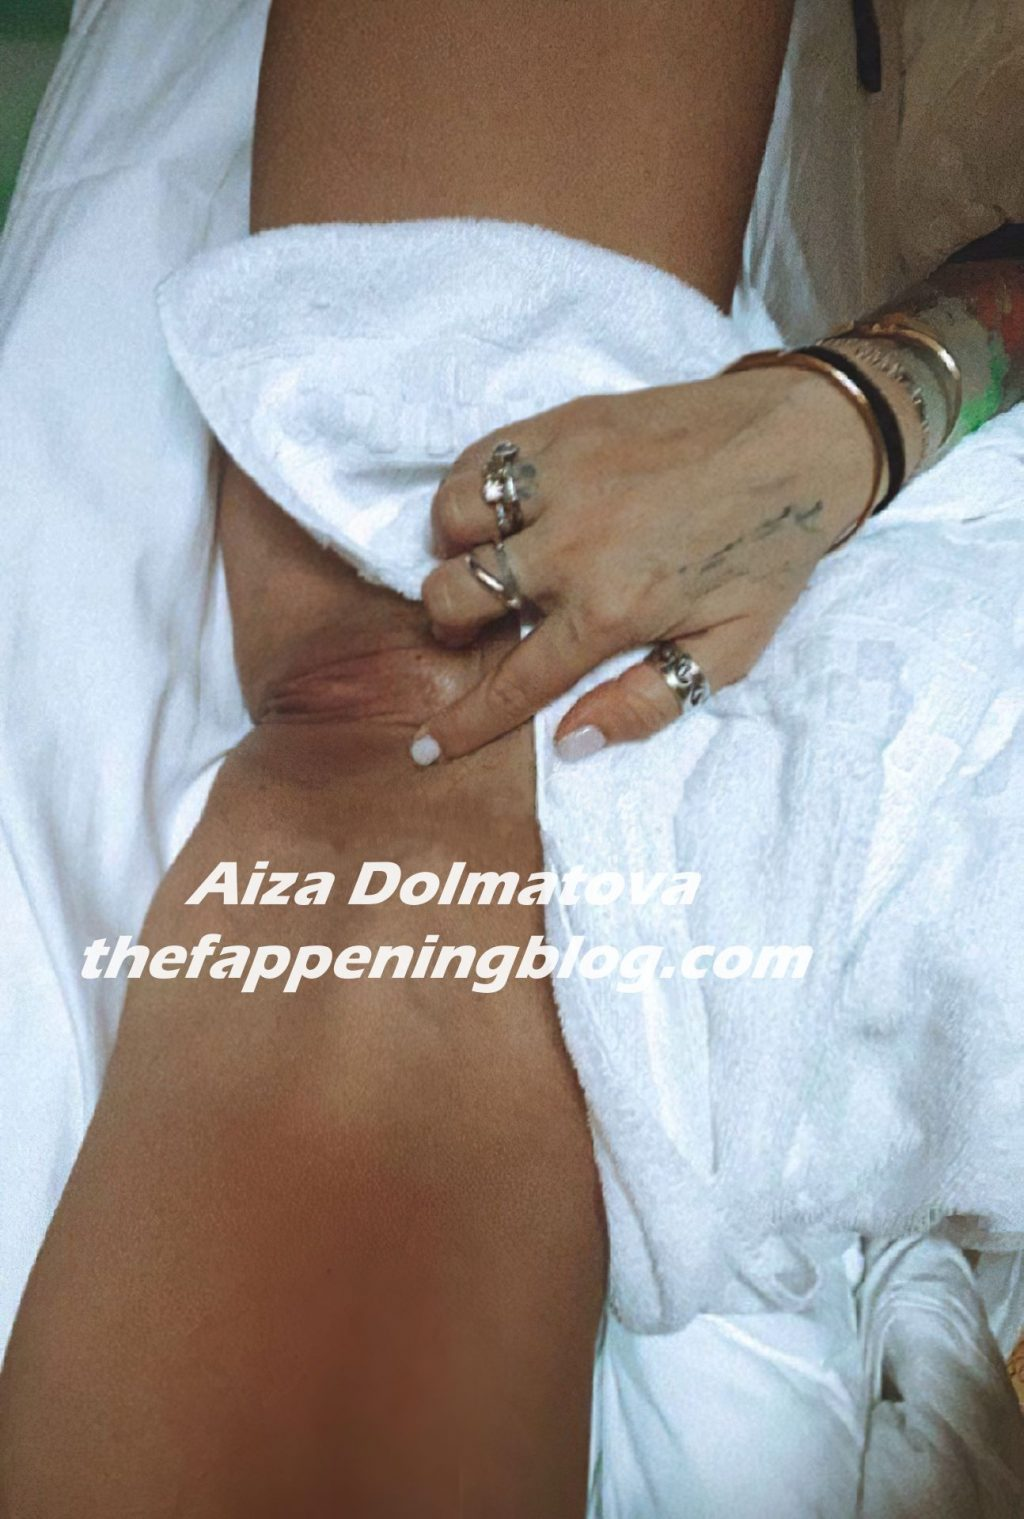 Aiza Dolmatova Shows Her Nude Pussy (1 Leaked Photo)